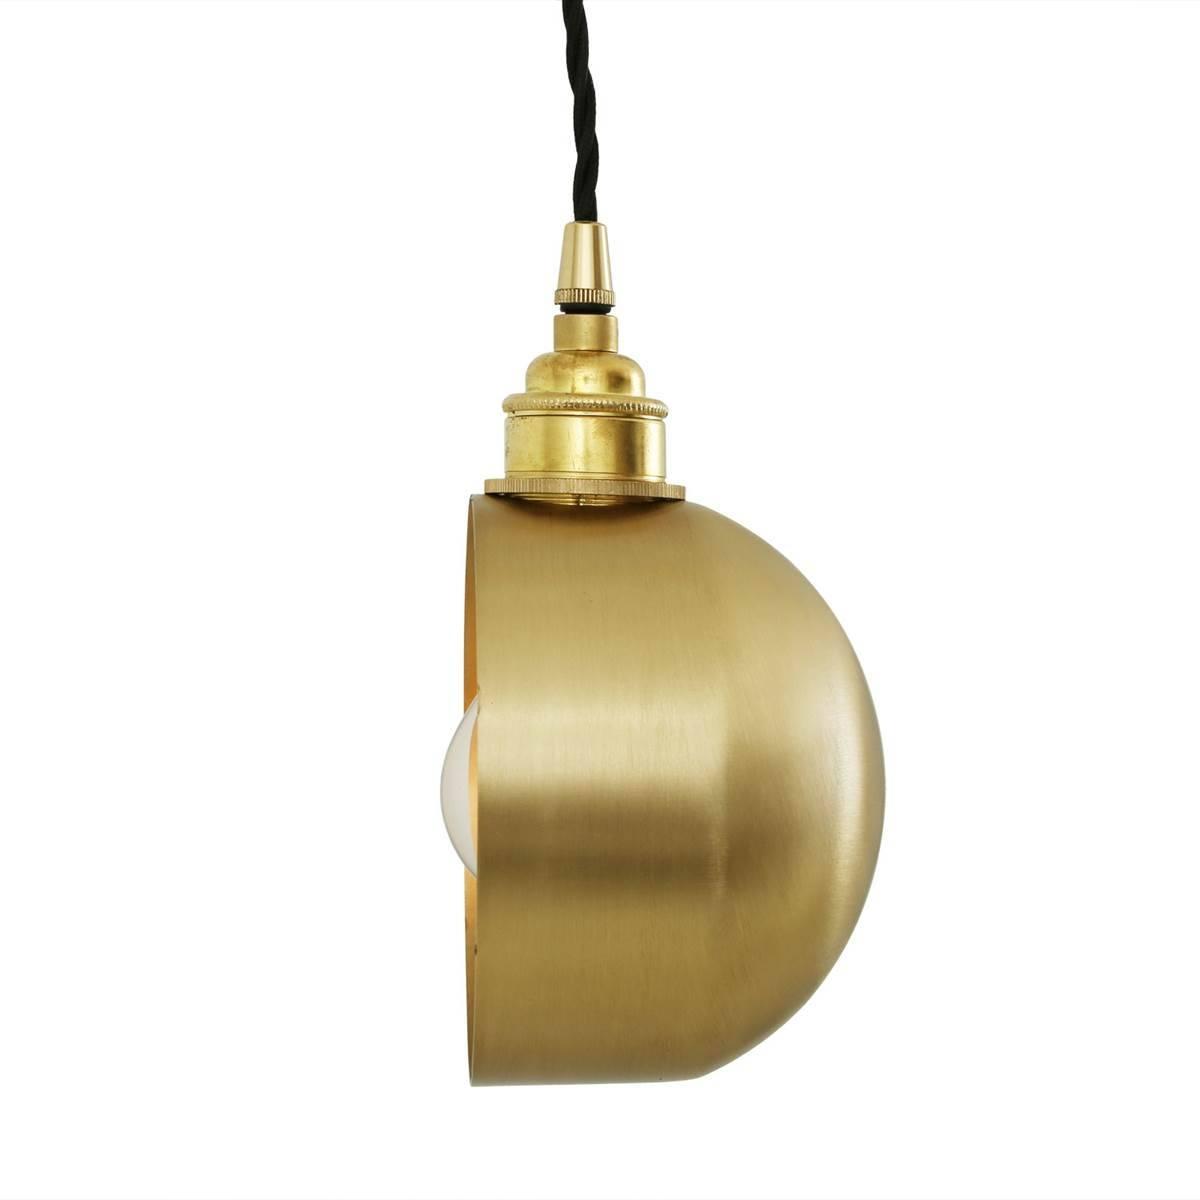 Bogota Modern Pendant Light | Mullan Lighting within Quirky Pendant Lights (Image 10 of 15)